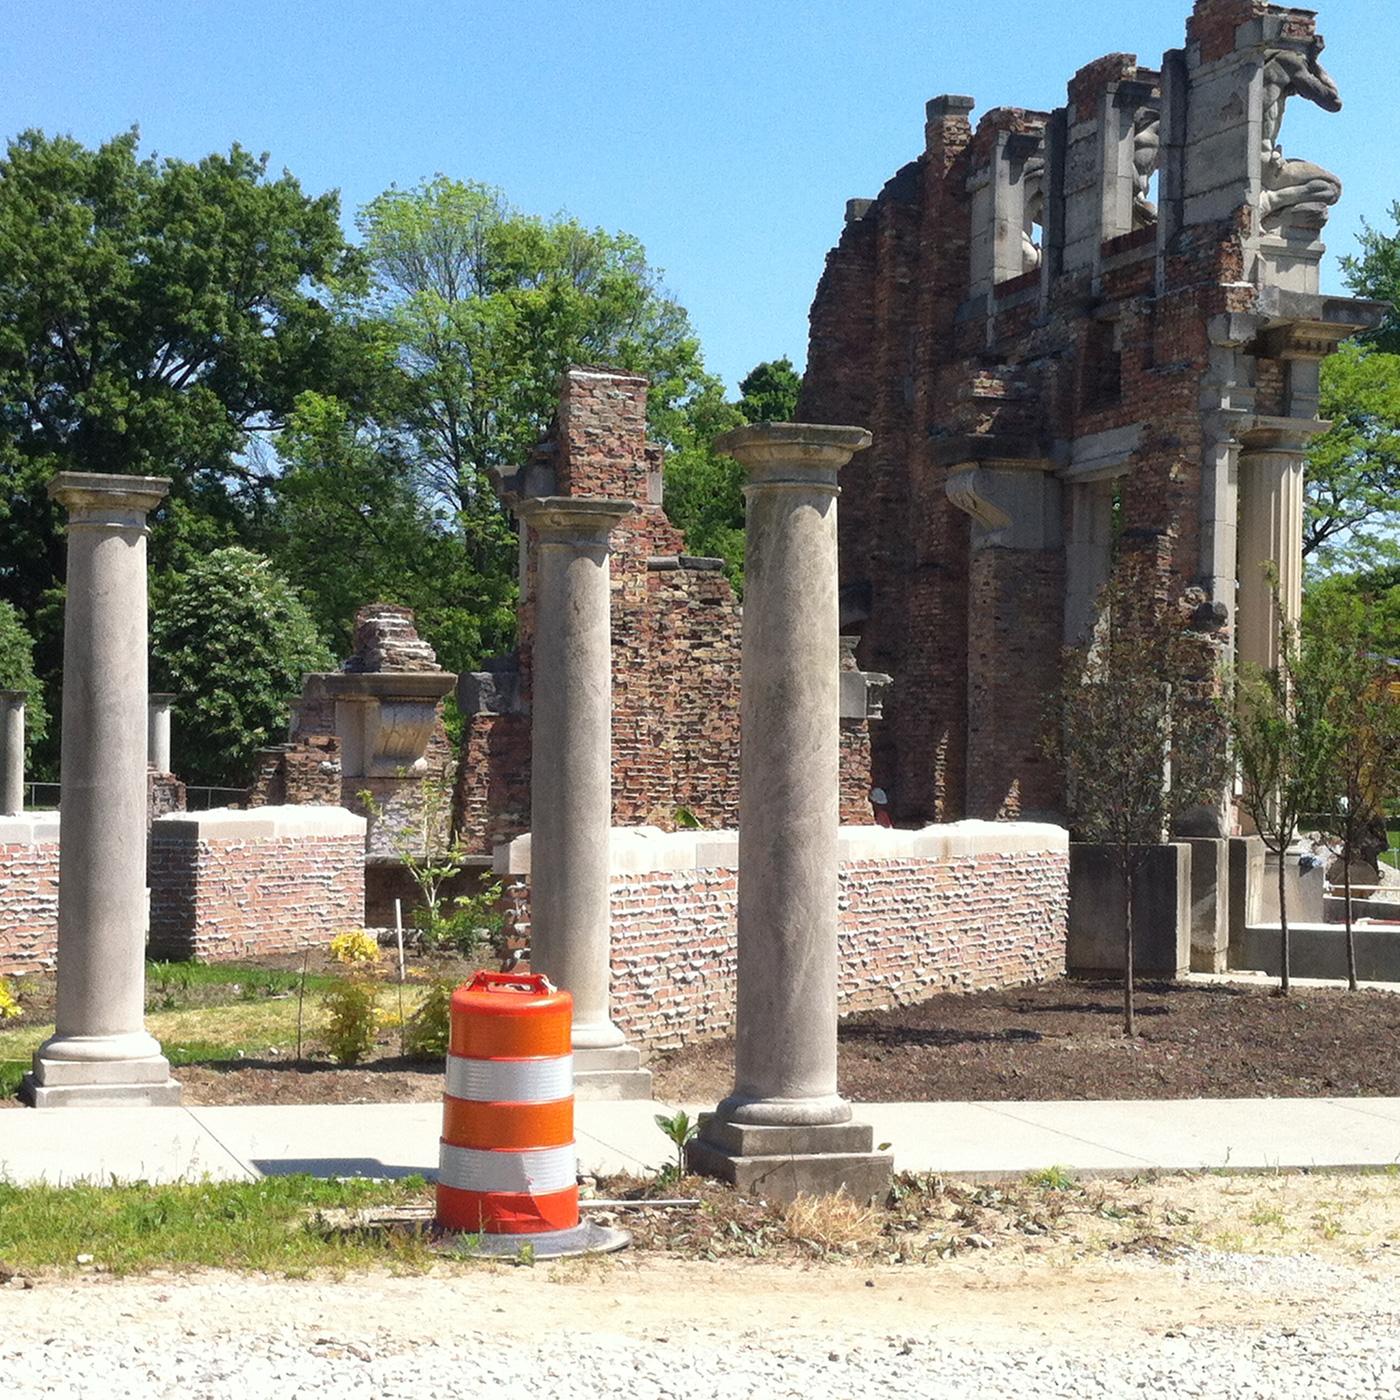 The Ruins at Holliday Park, Indianapolis, June 2016.